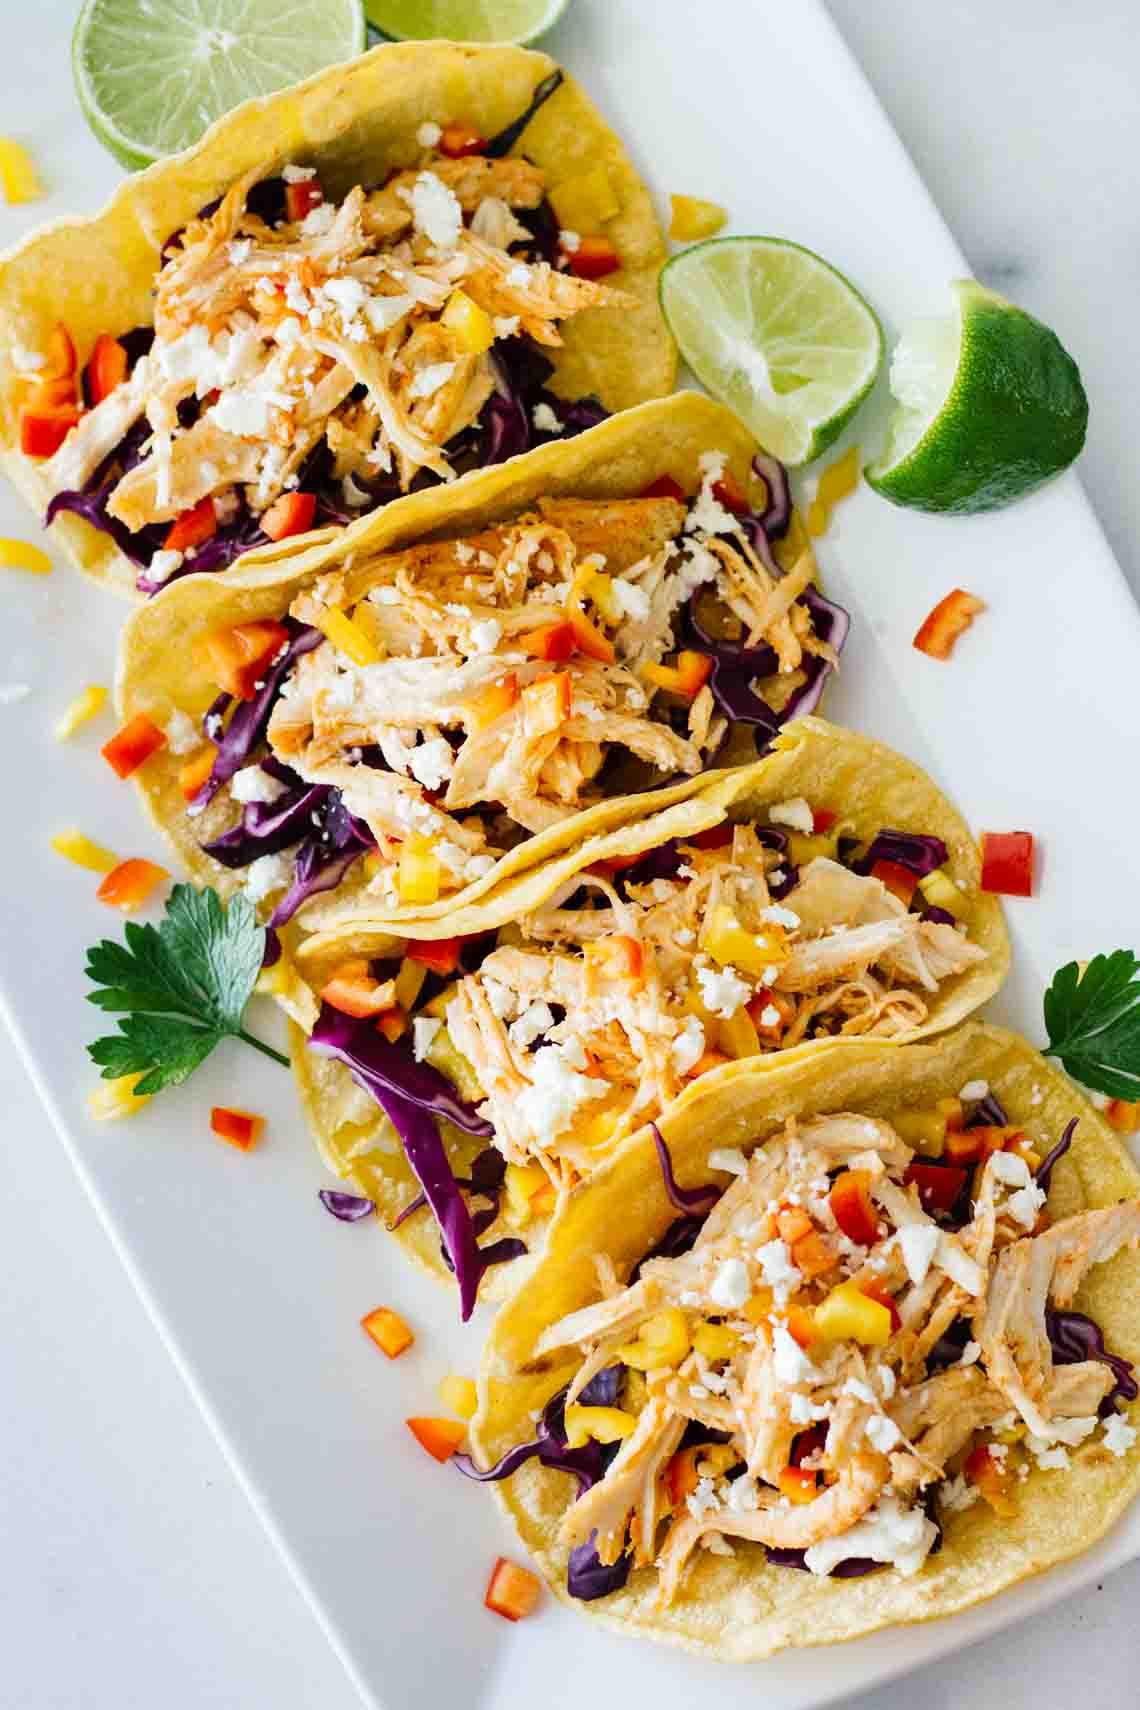 Healthy Recipes For Dinner  Healthy Sriracha Shredded Chicken Tacos Jar Lemons